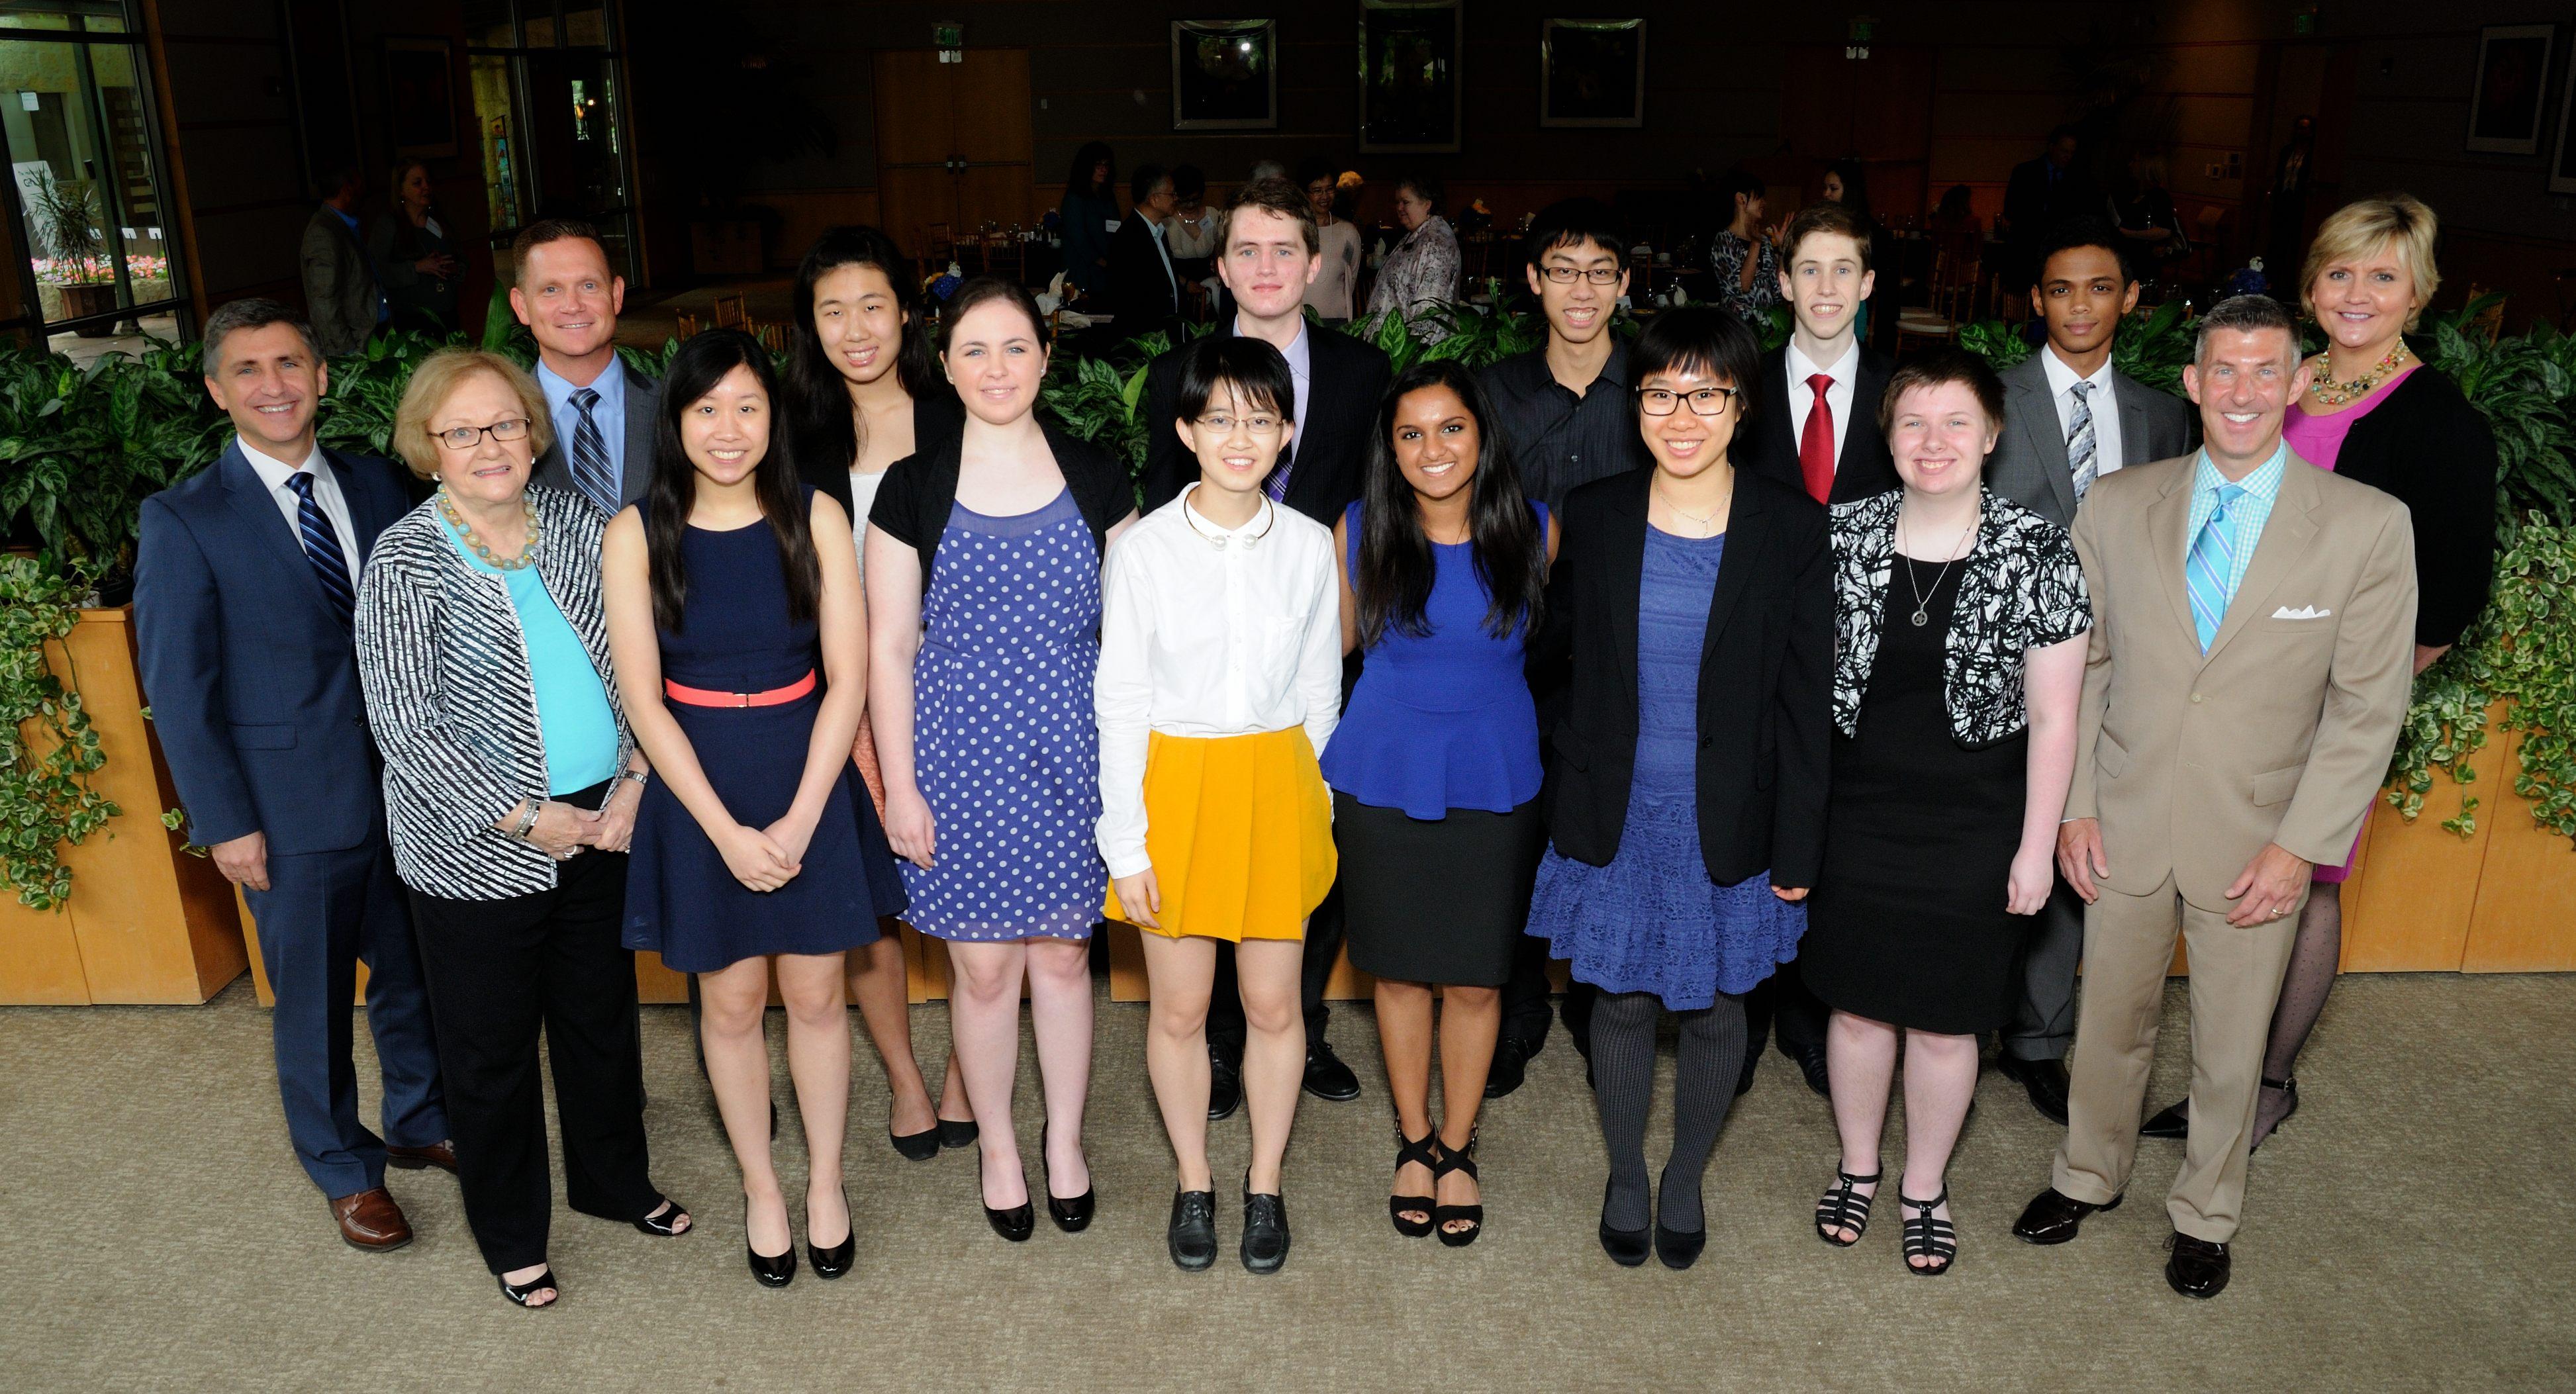 TI names 23 Junkins National Merit Scholarship® winners